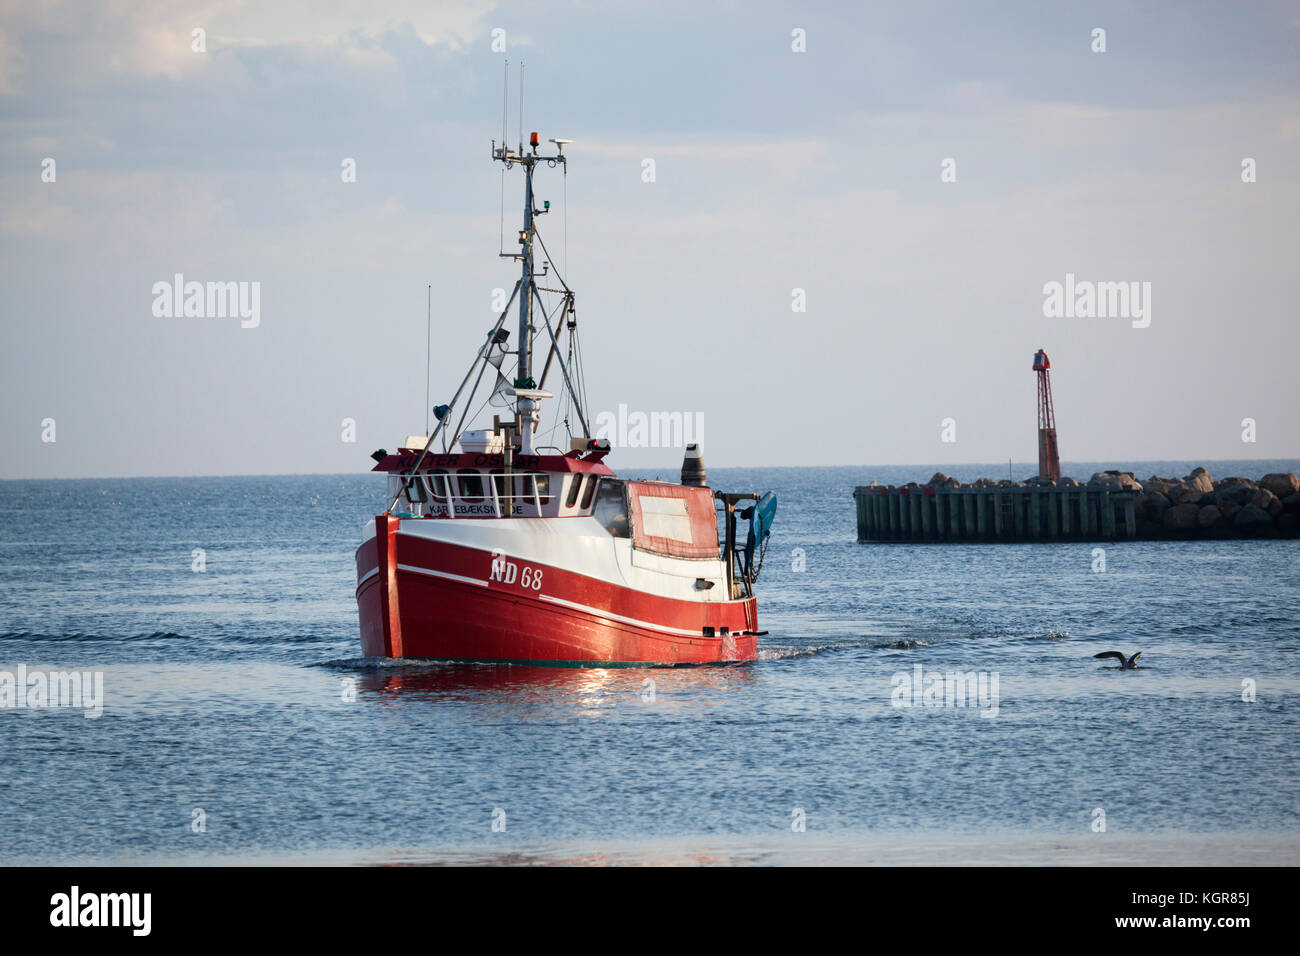 Danish fishing trawler returning to harbour in early morning, Gilleleje, Kattegat Coast, Zealand, Denmark, Europe - Stock Image